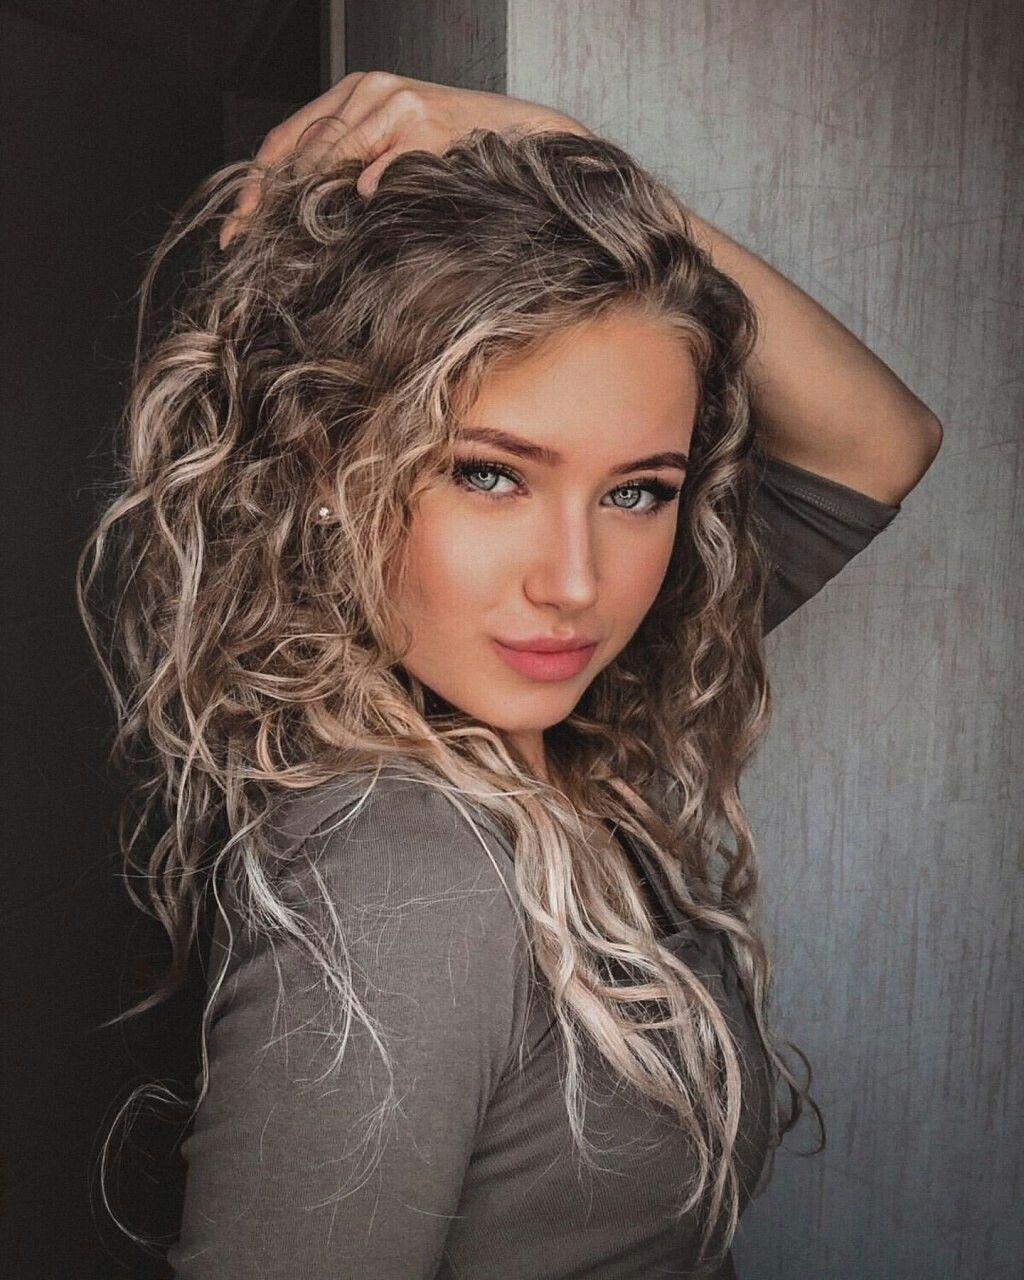 Hot girls celebraties Top 10 Hottest Female Instagram Celebrities Watchmojo Com